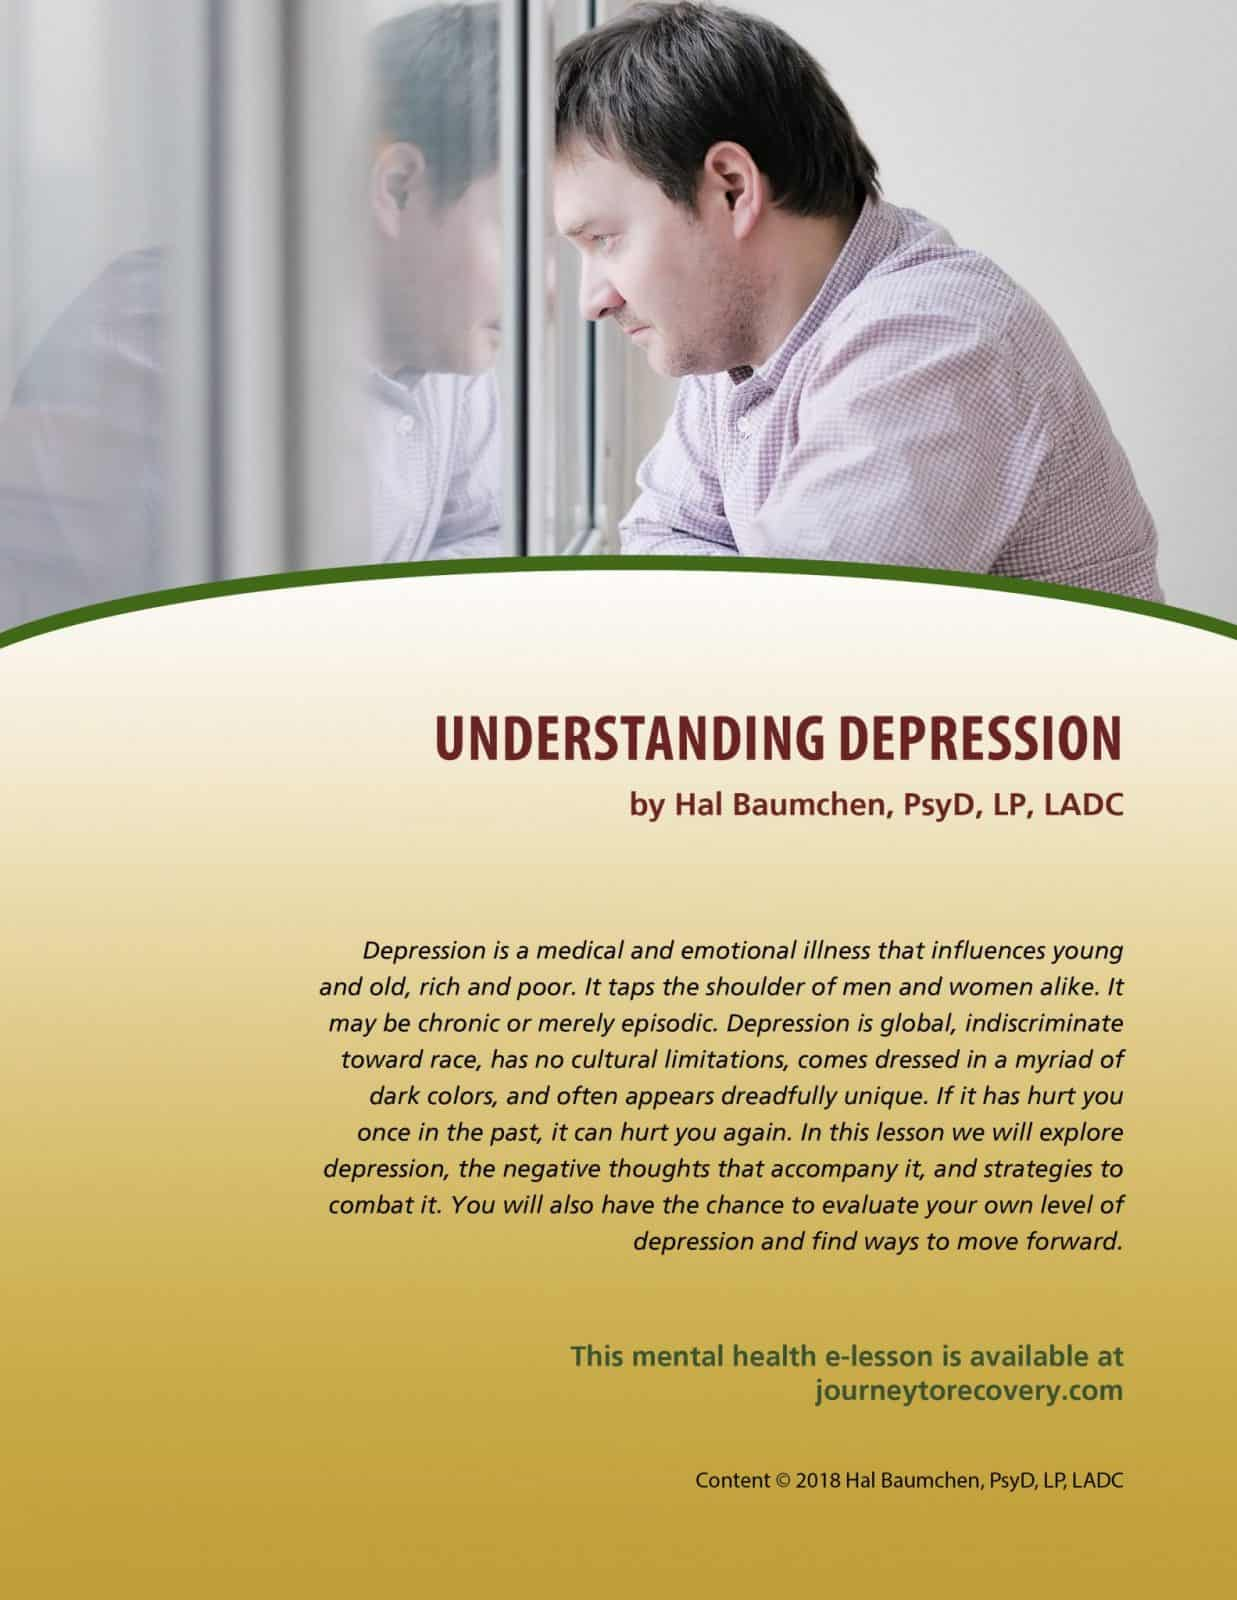 Understanding Depression (MH Lesson)